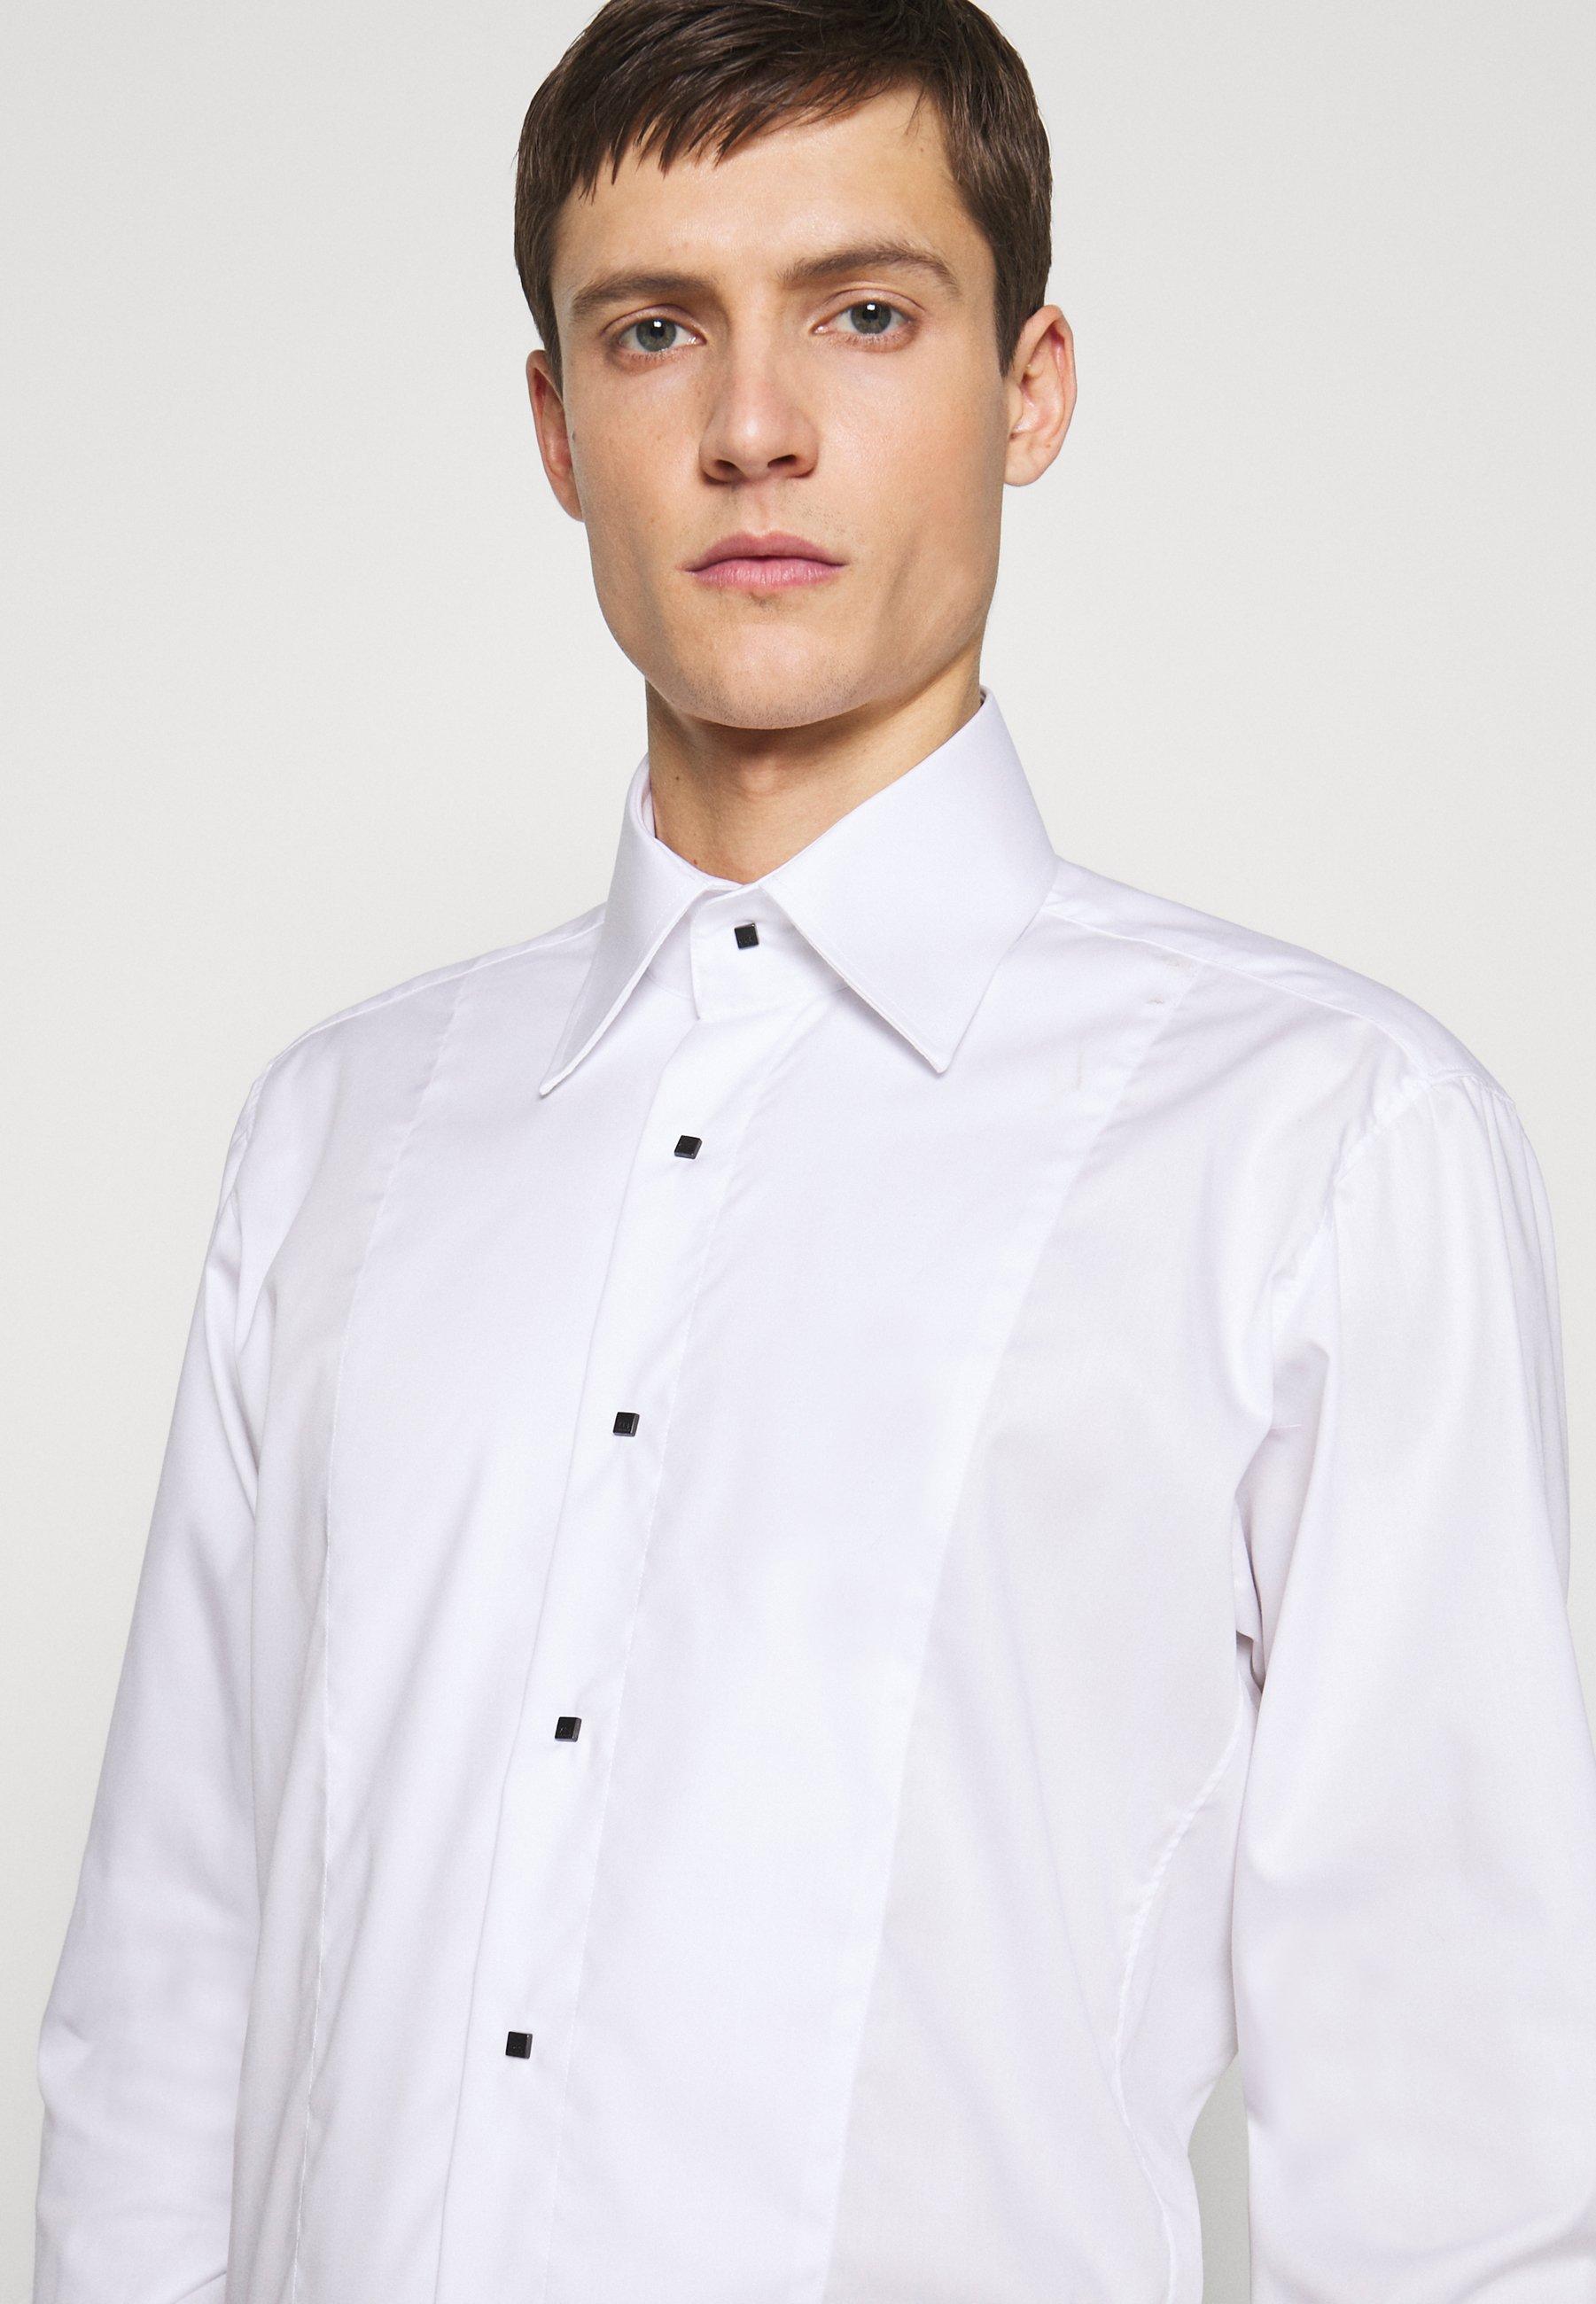 KARL LAGERFELD SHIRT MODERN FIT - Koszula - white